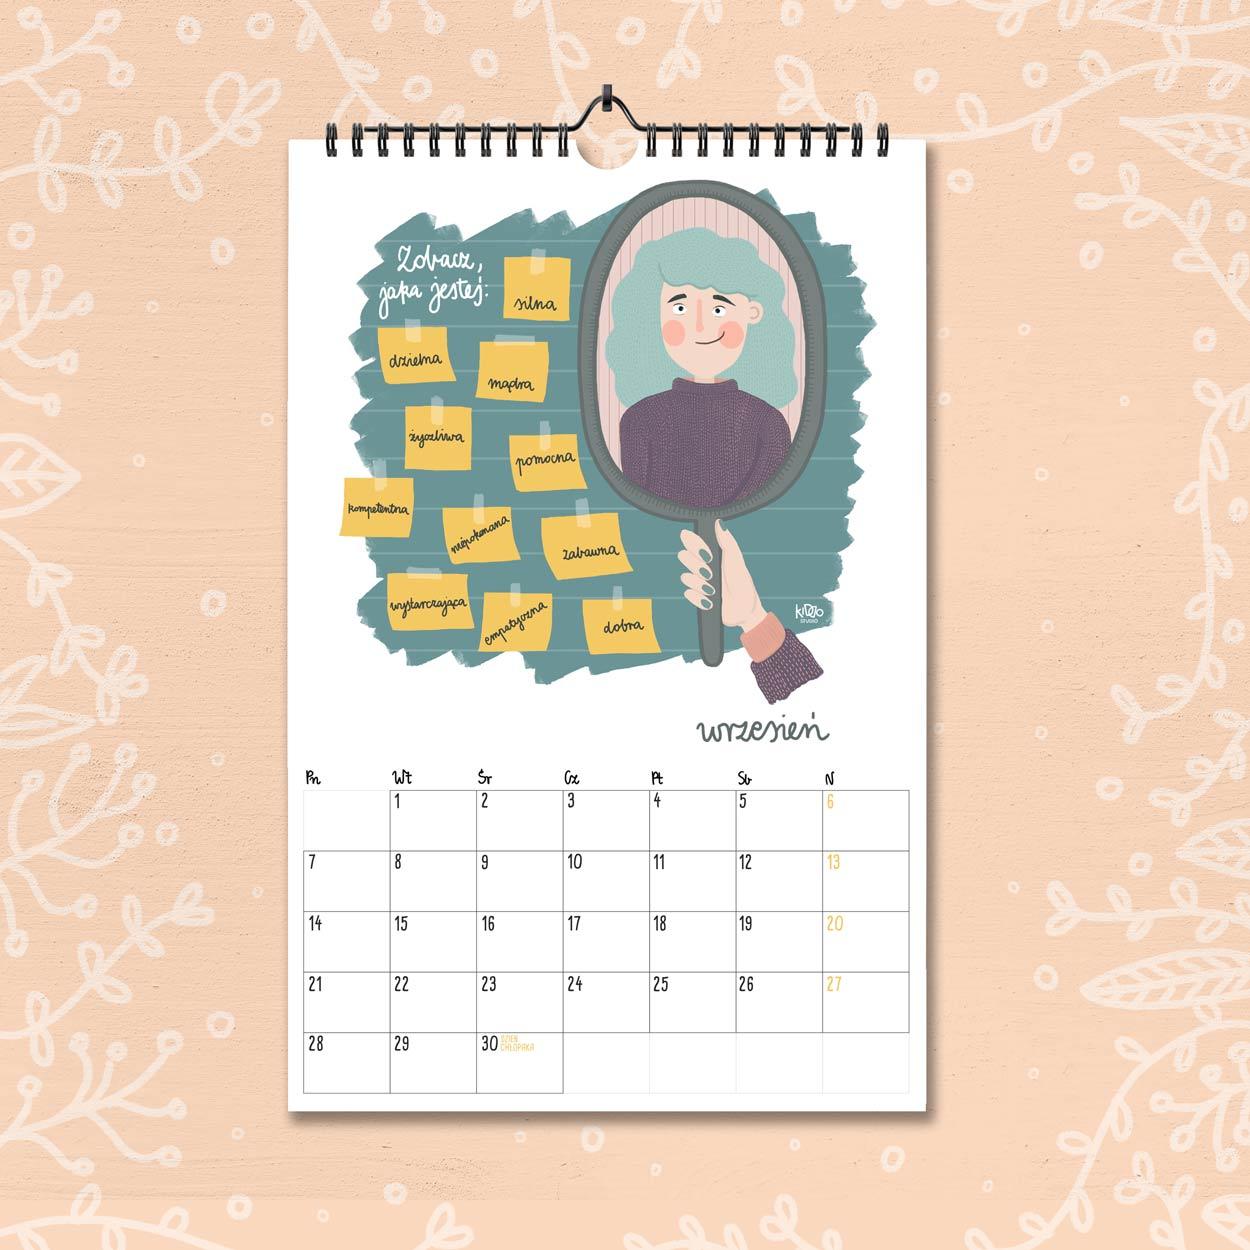 kalendarz 2020 wrzesien